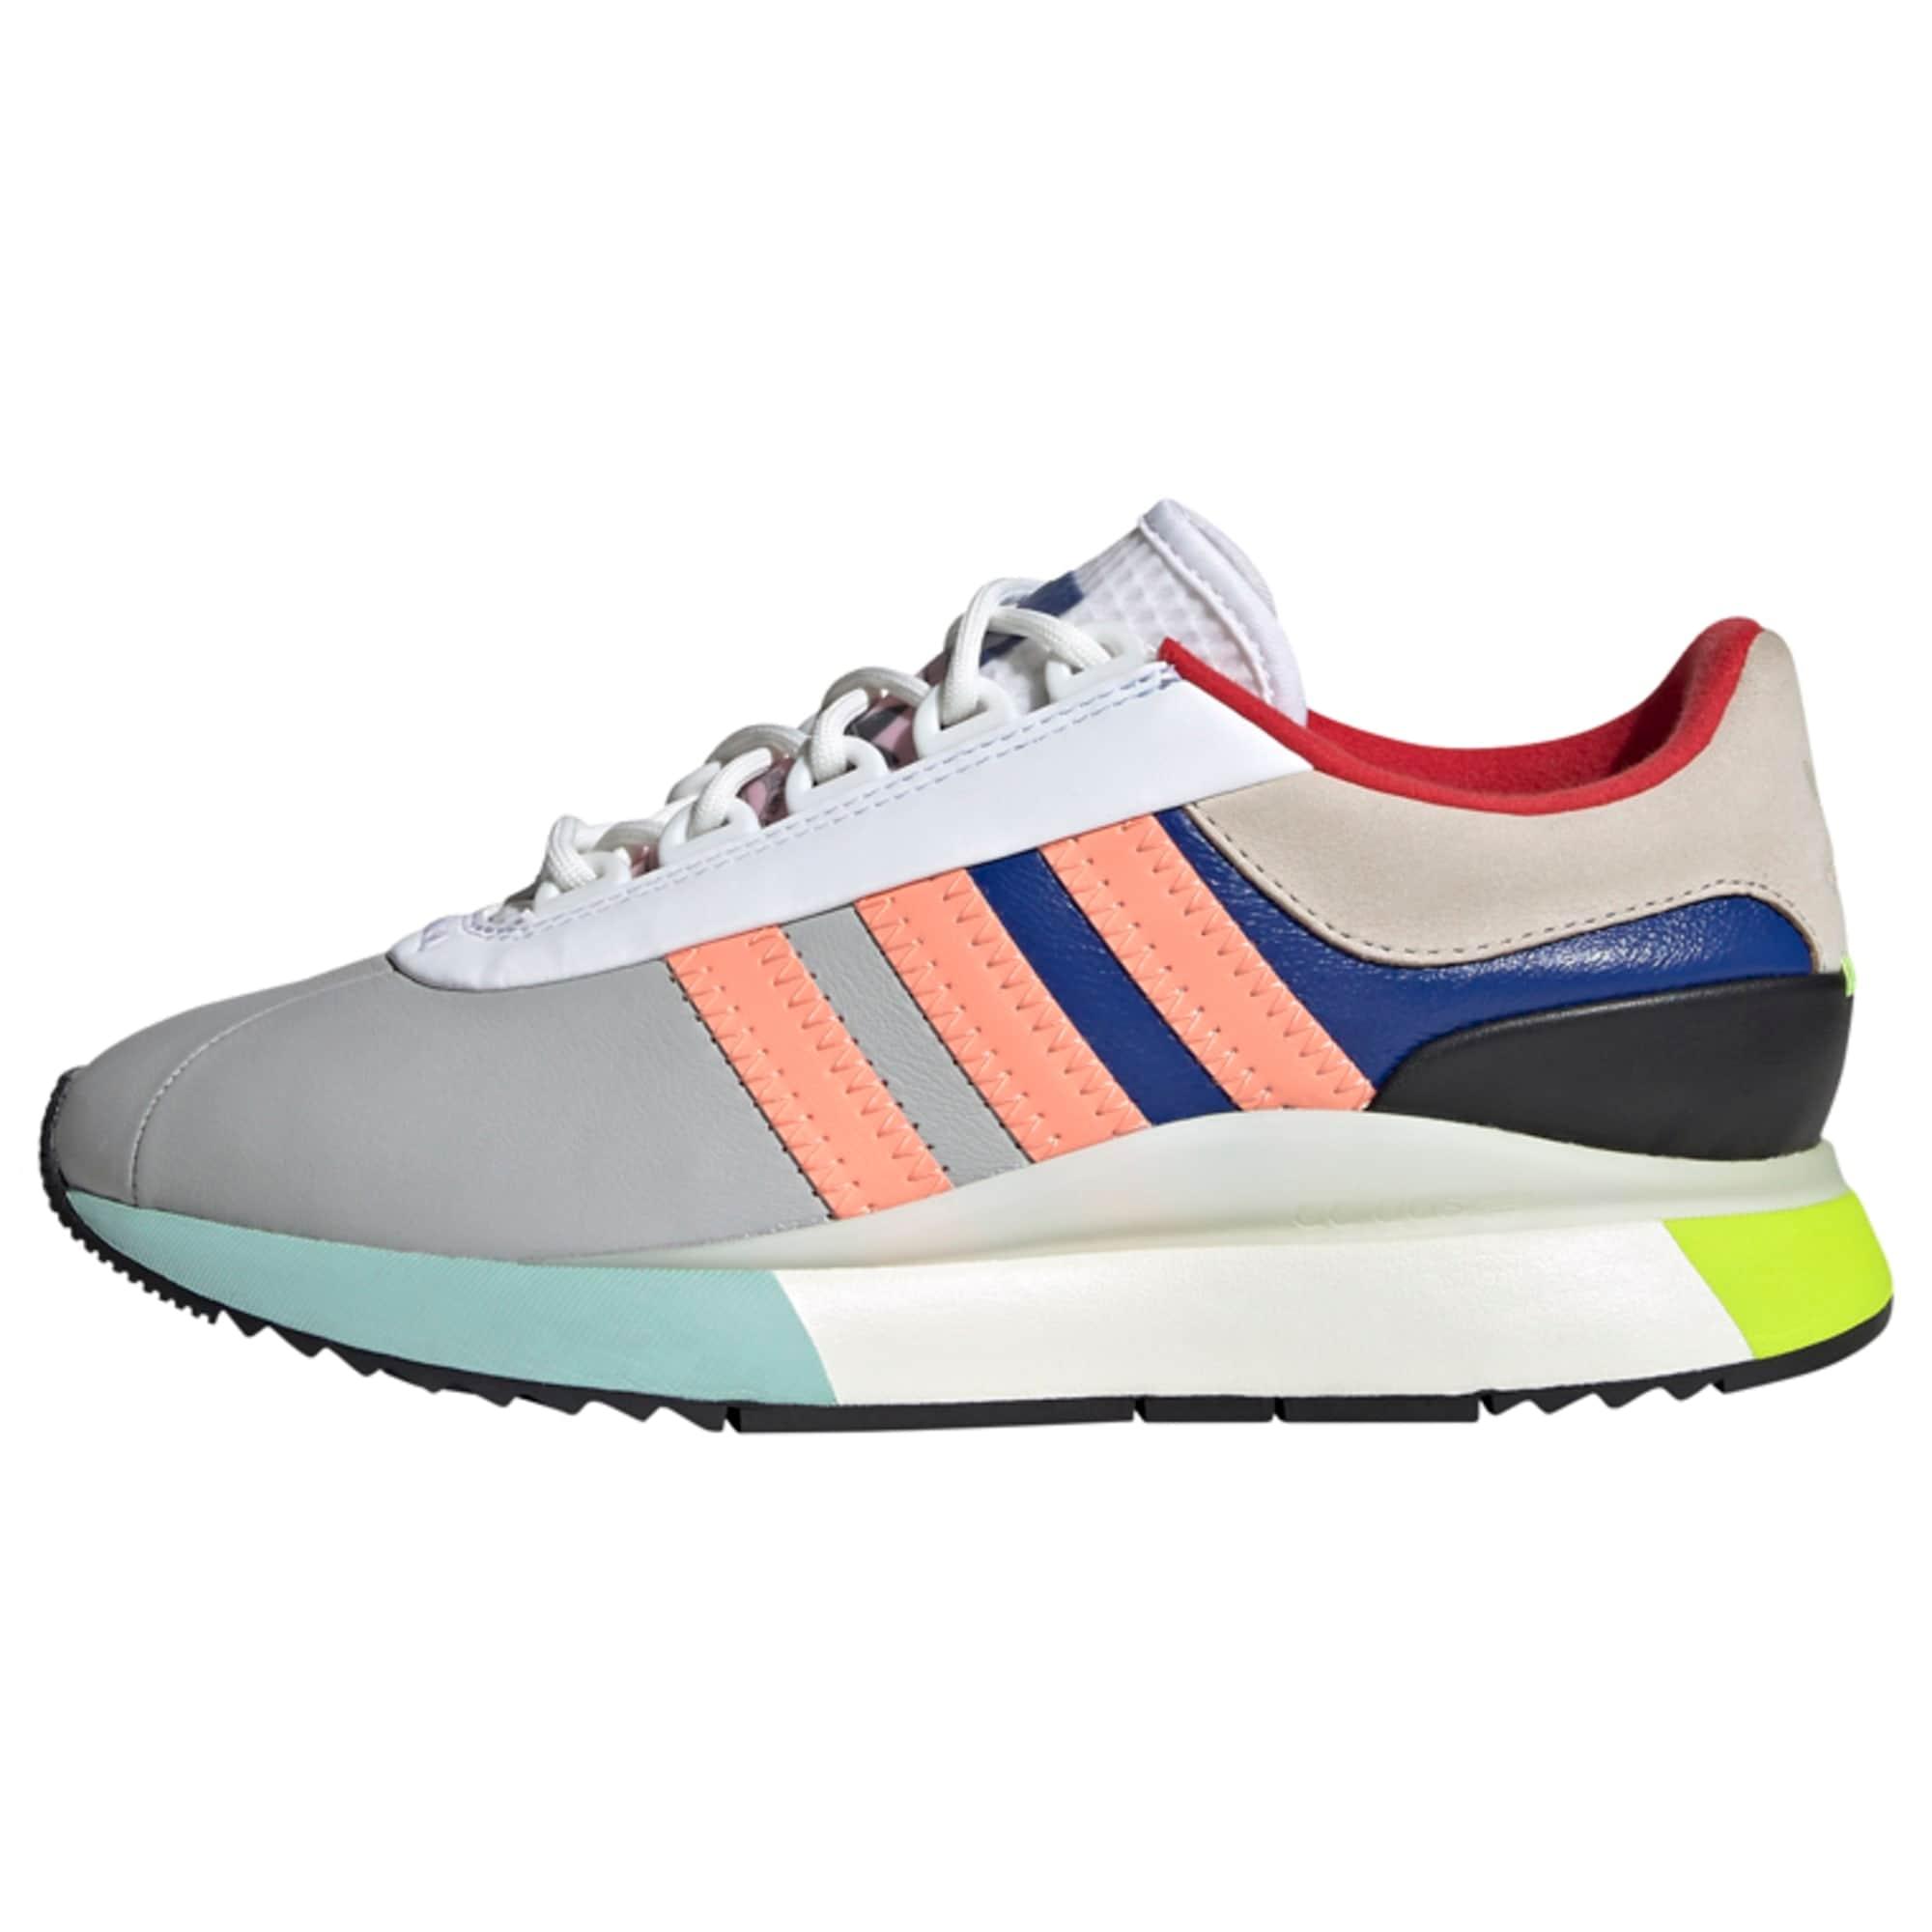 ADIDAS ORIGINALS Sneaker  sivá / lososová / tmavomodrá / jablková / tyrkysová